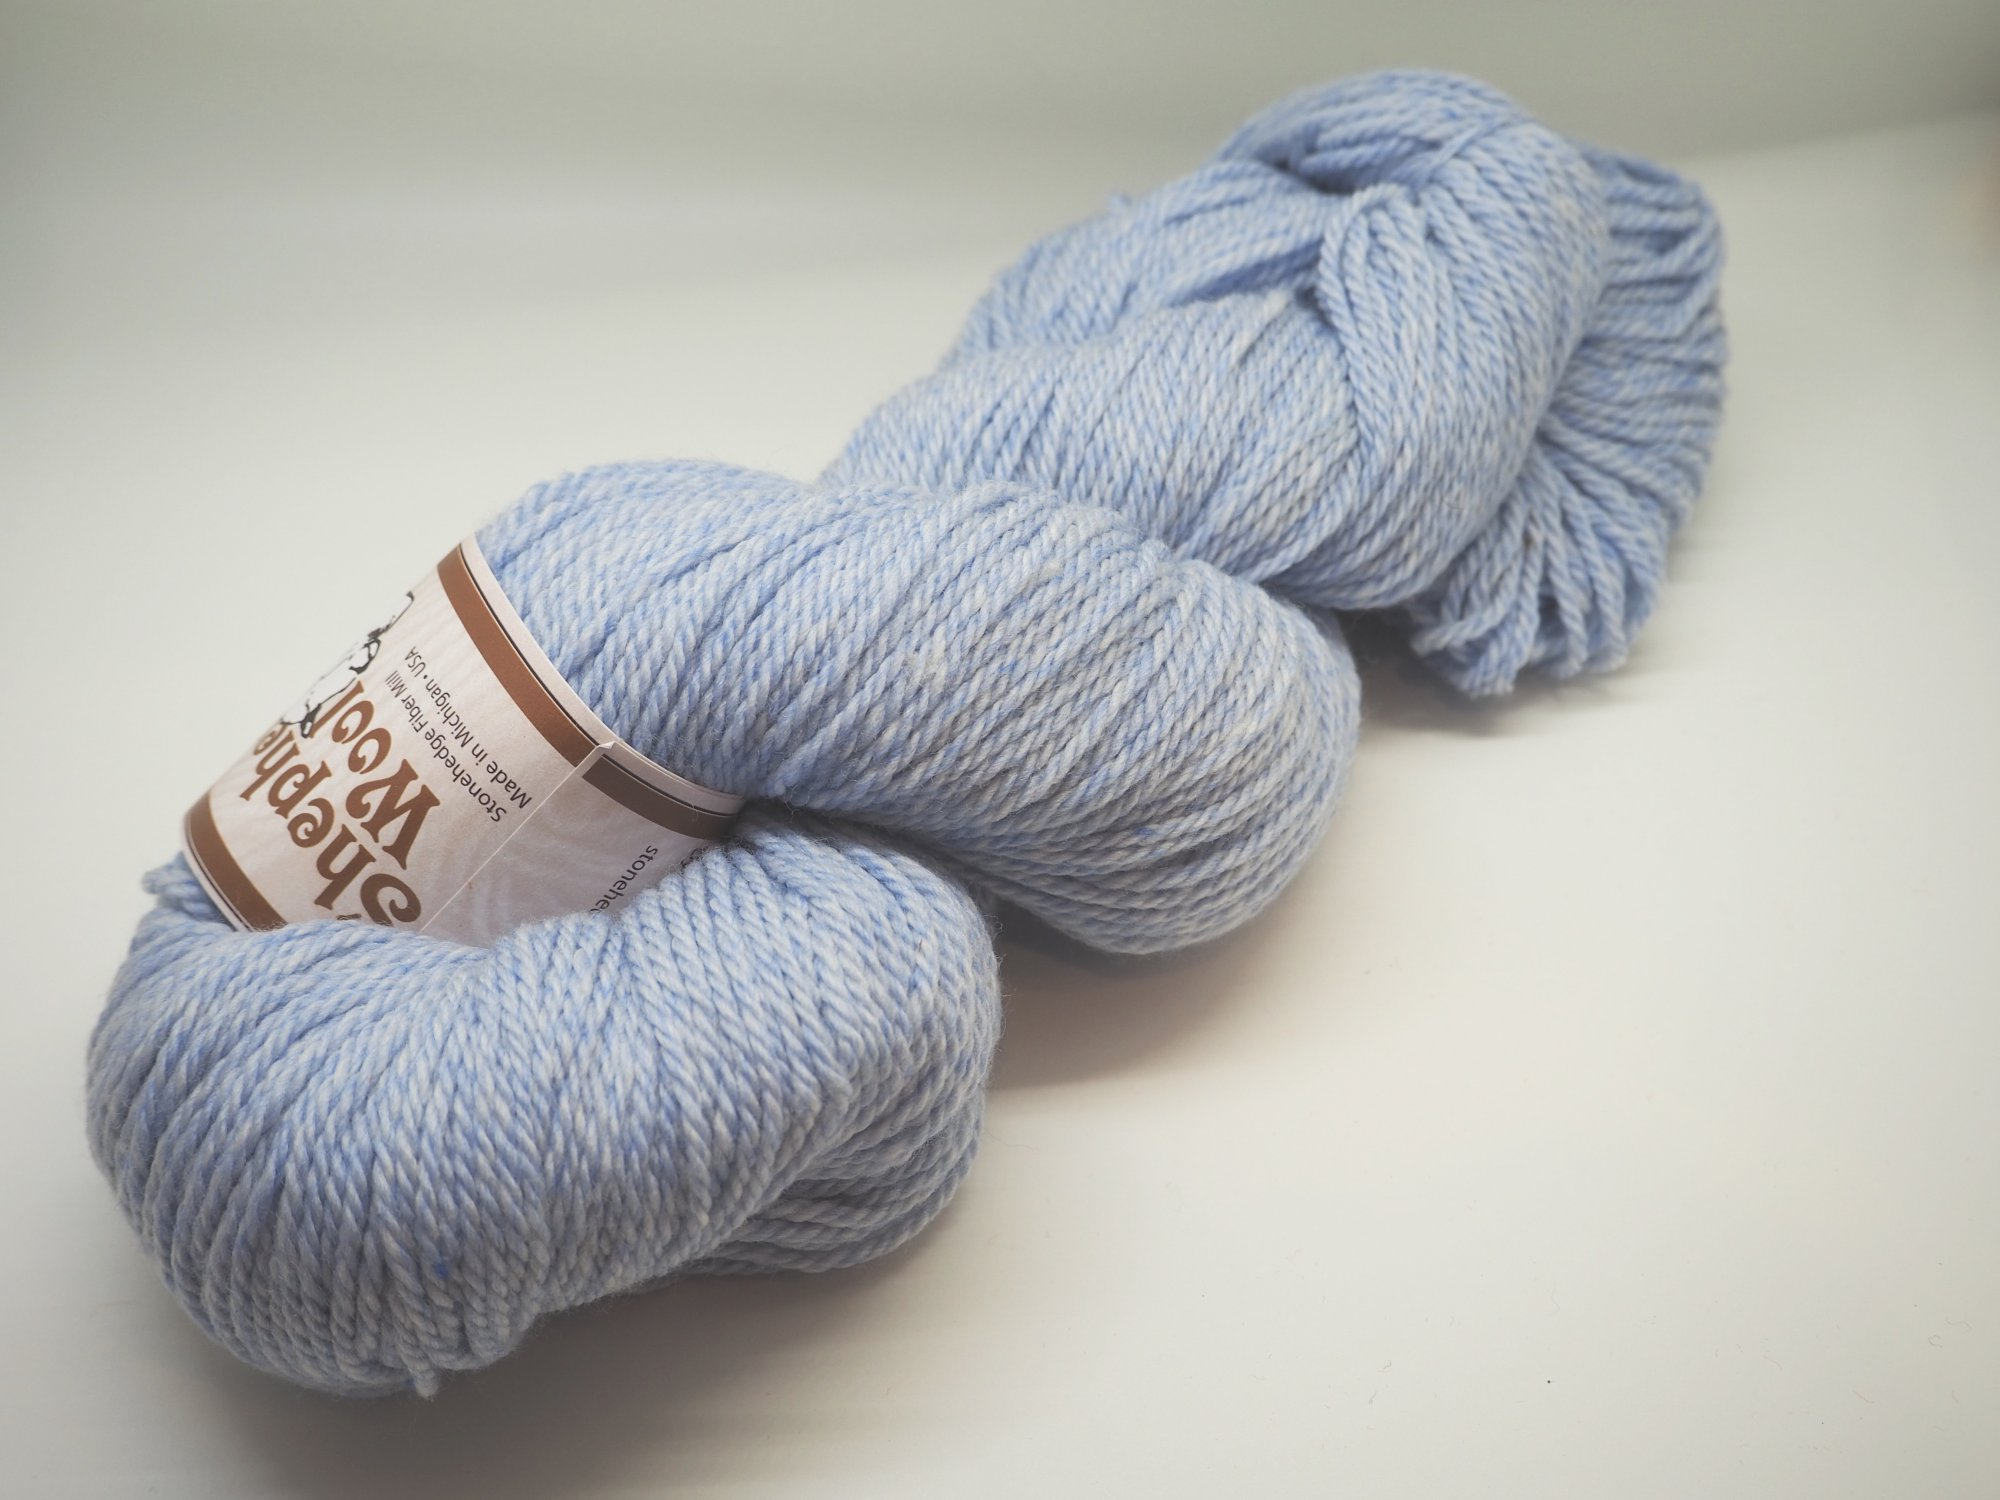 Shepherds Wool